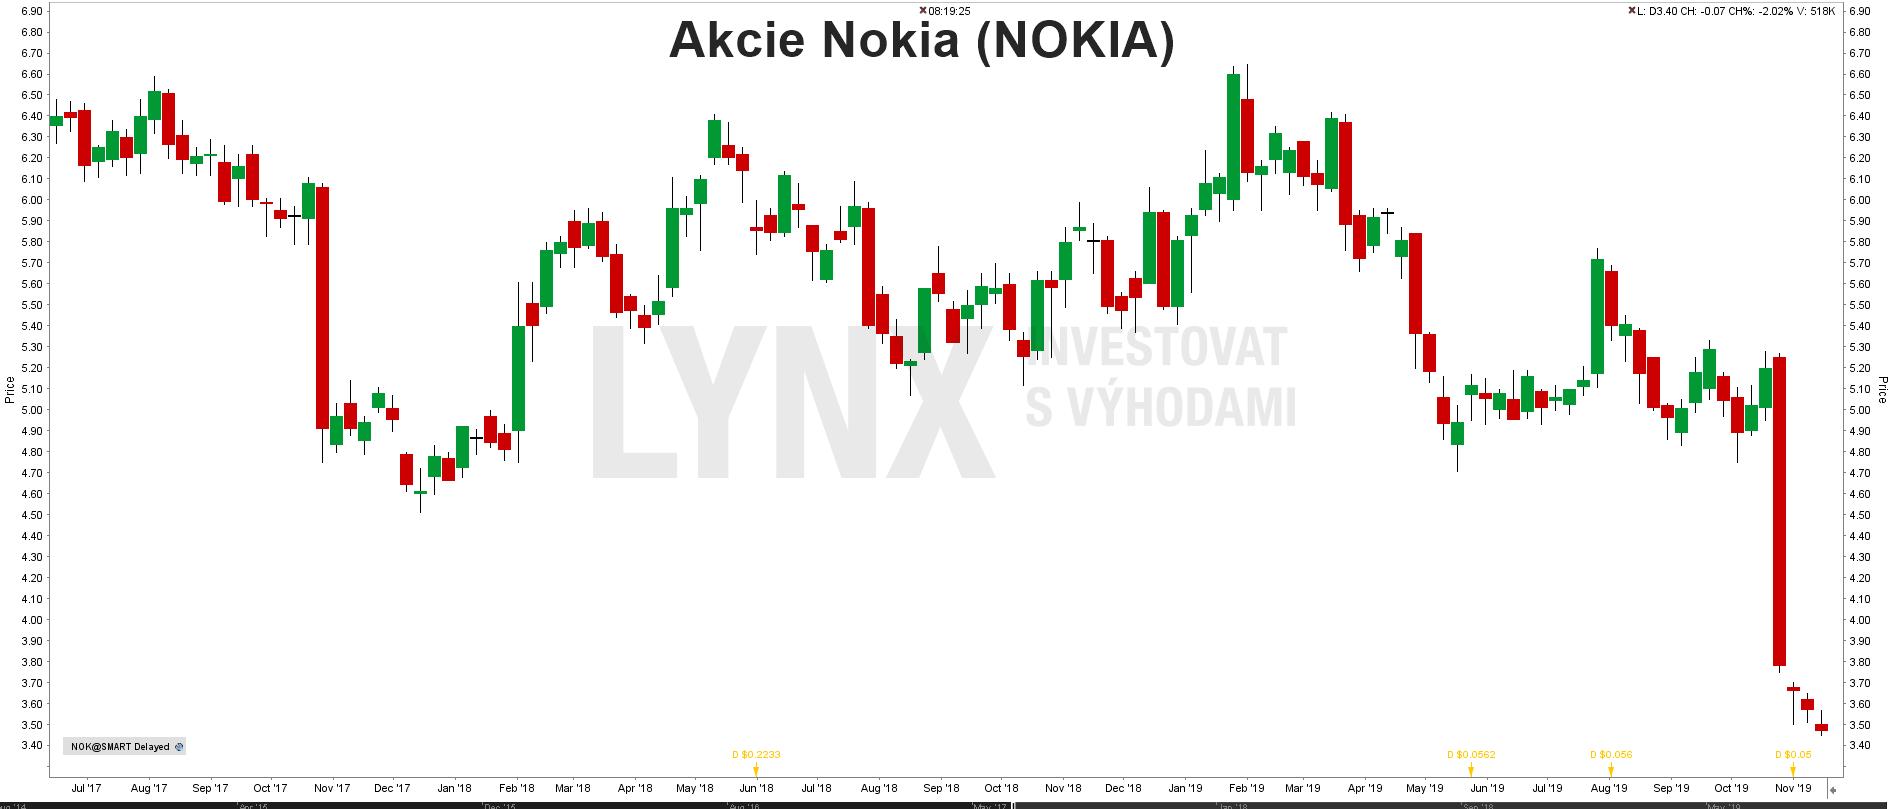 Akcie Nokia - graf